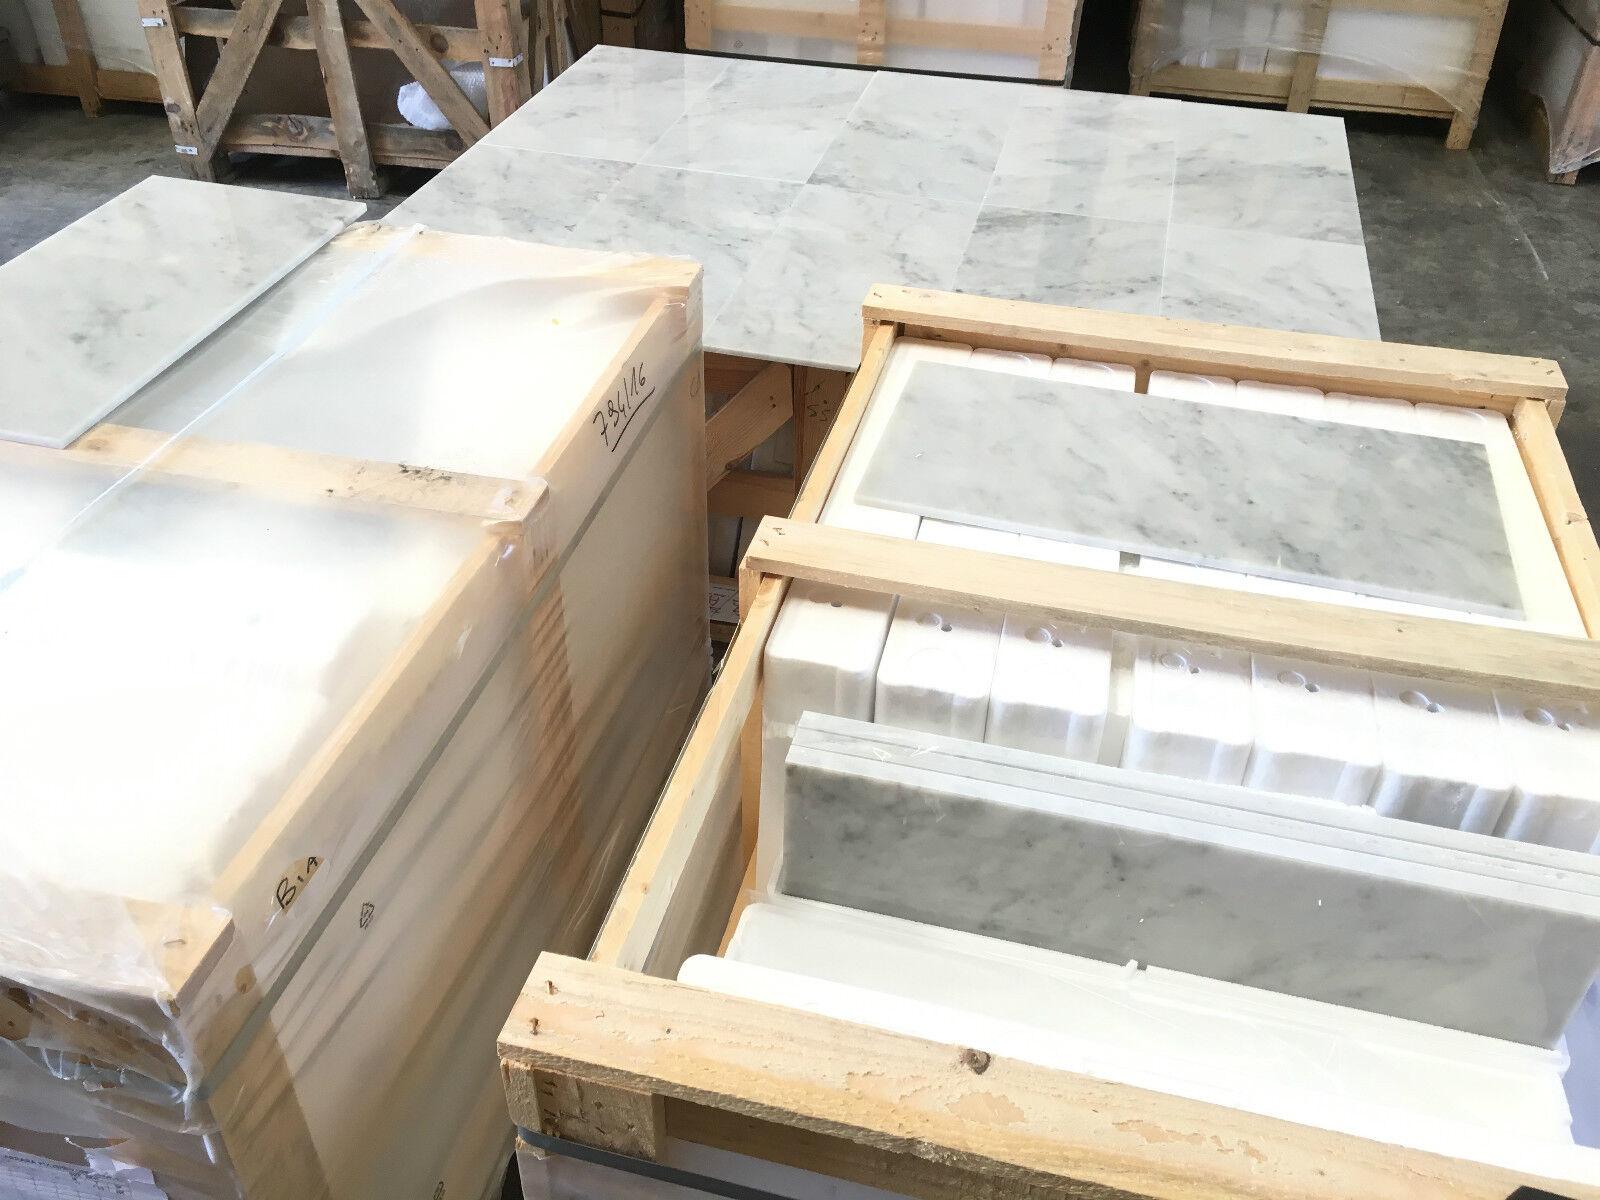 Bianco Carrara, Polished Polished Polished Marble Tile, Floor & Wall Tiles, 12x24